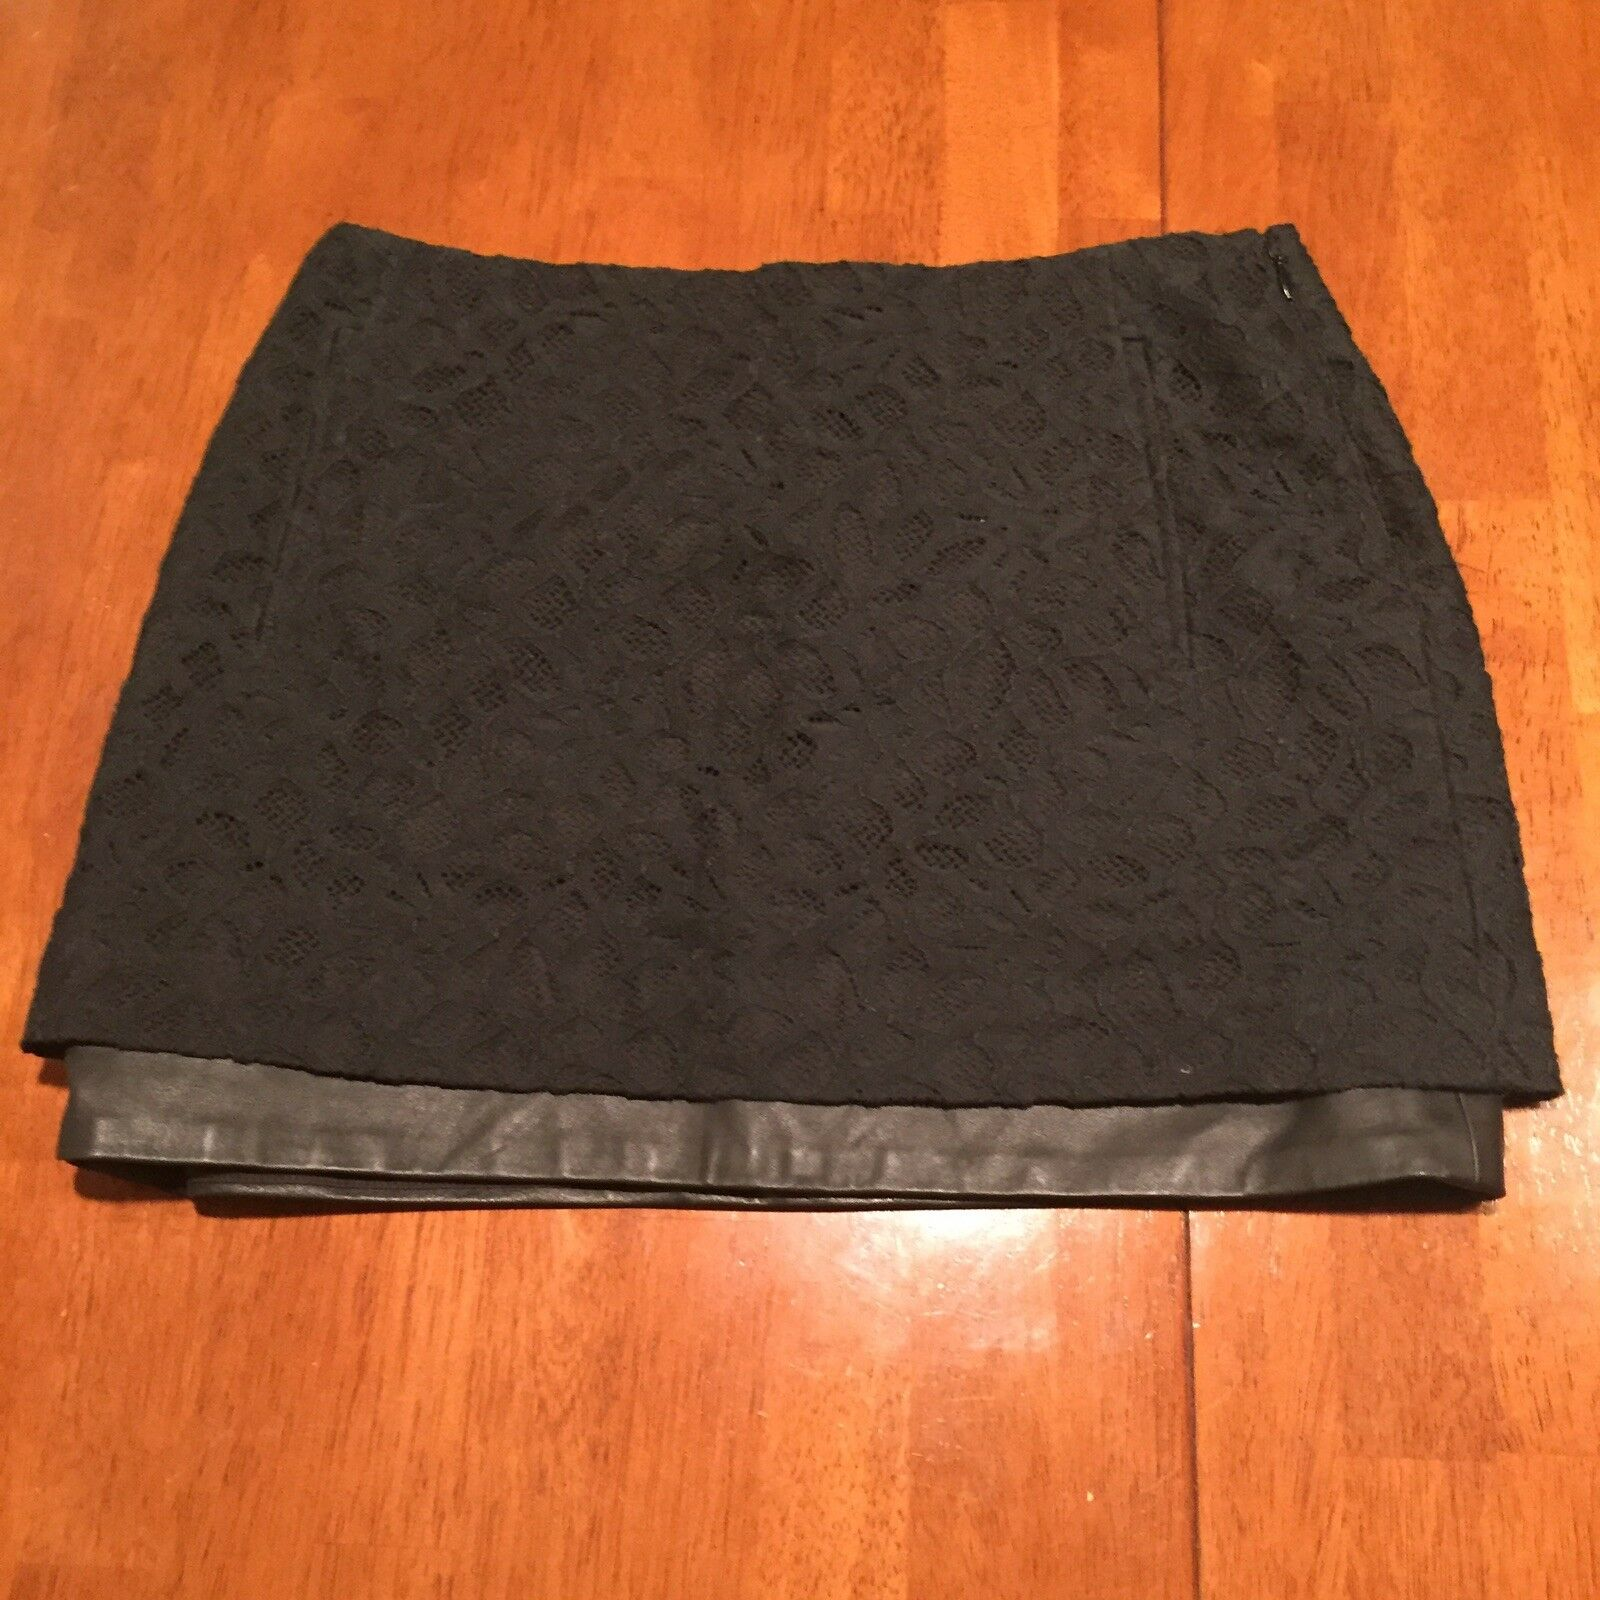 NWT Diane Von Furstenberg DVF Elley Leather Lace Mini Skirt Lace  298 Sz 2